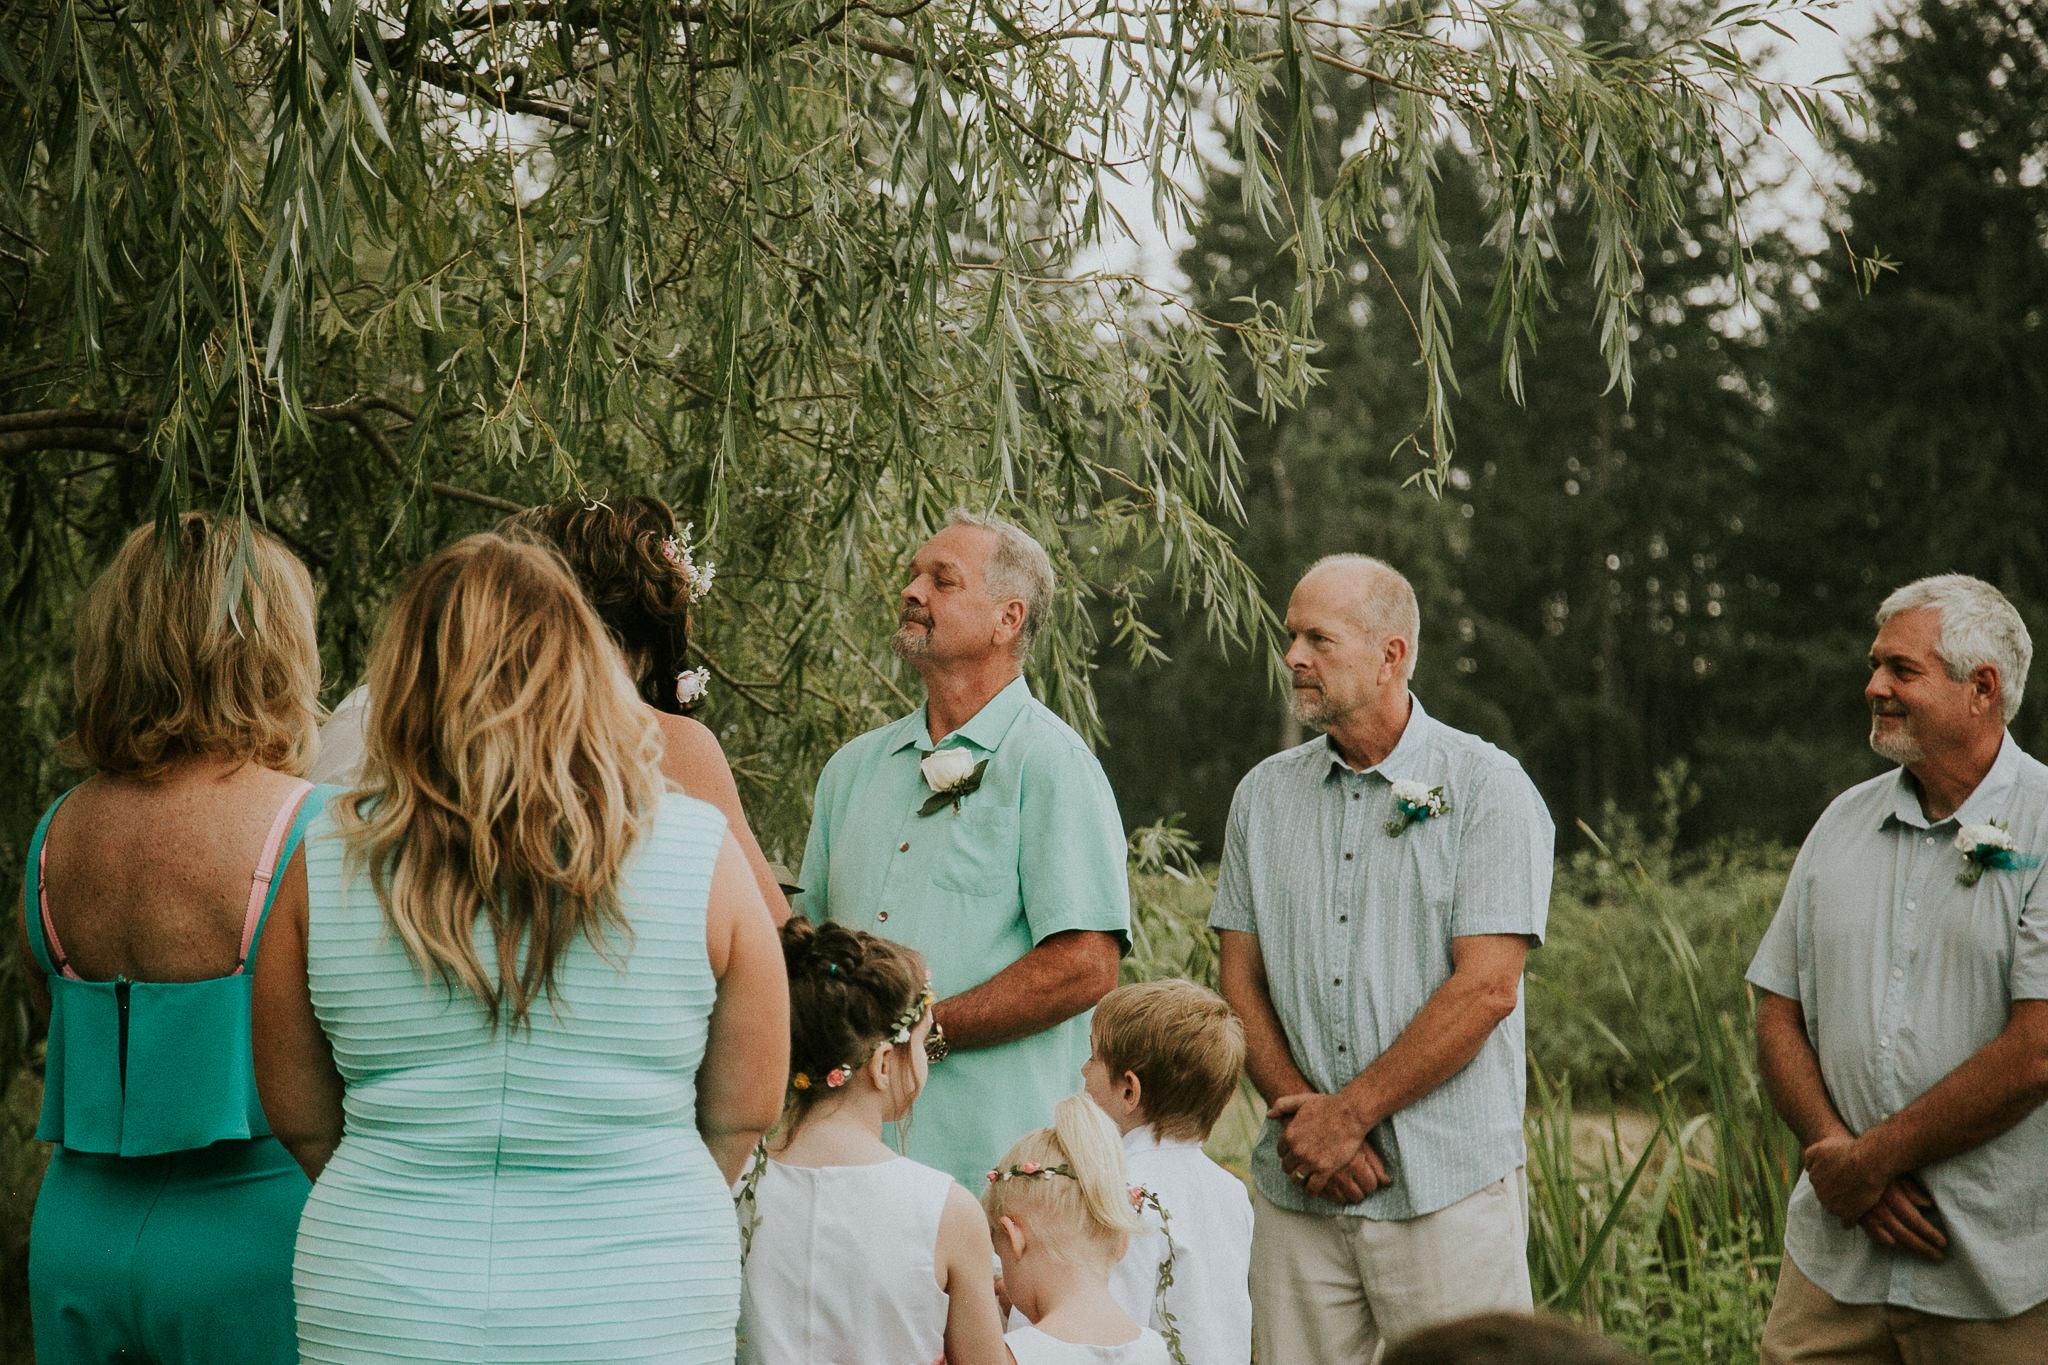 Backyard-Elopement-Ceremony-69.jpg